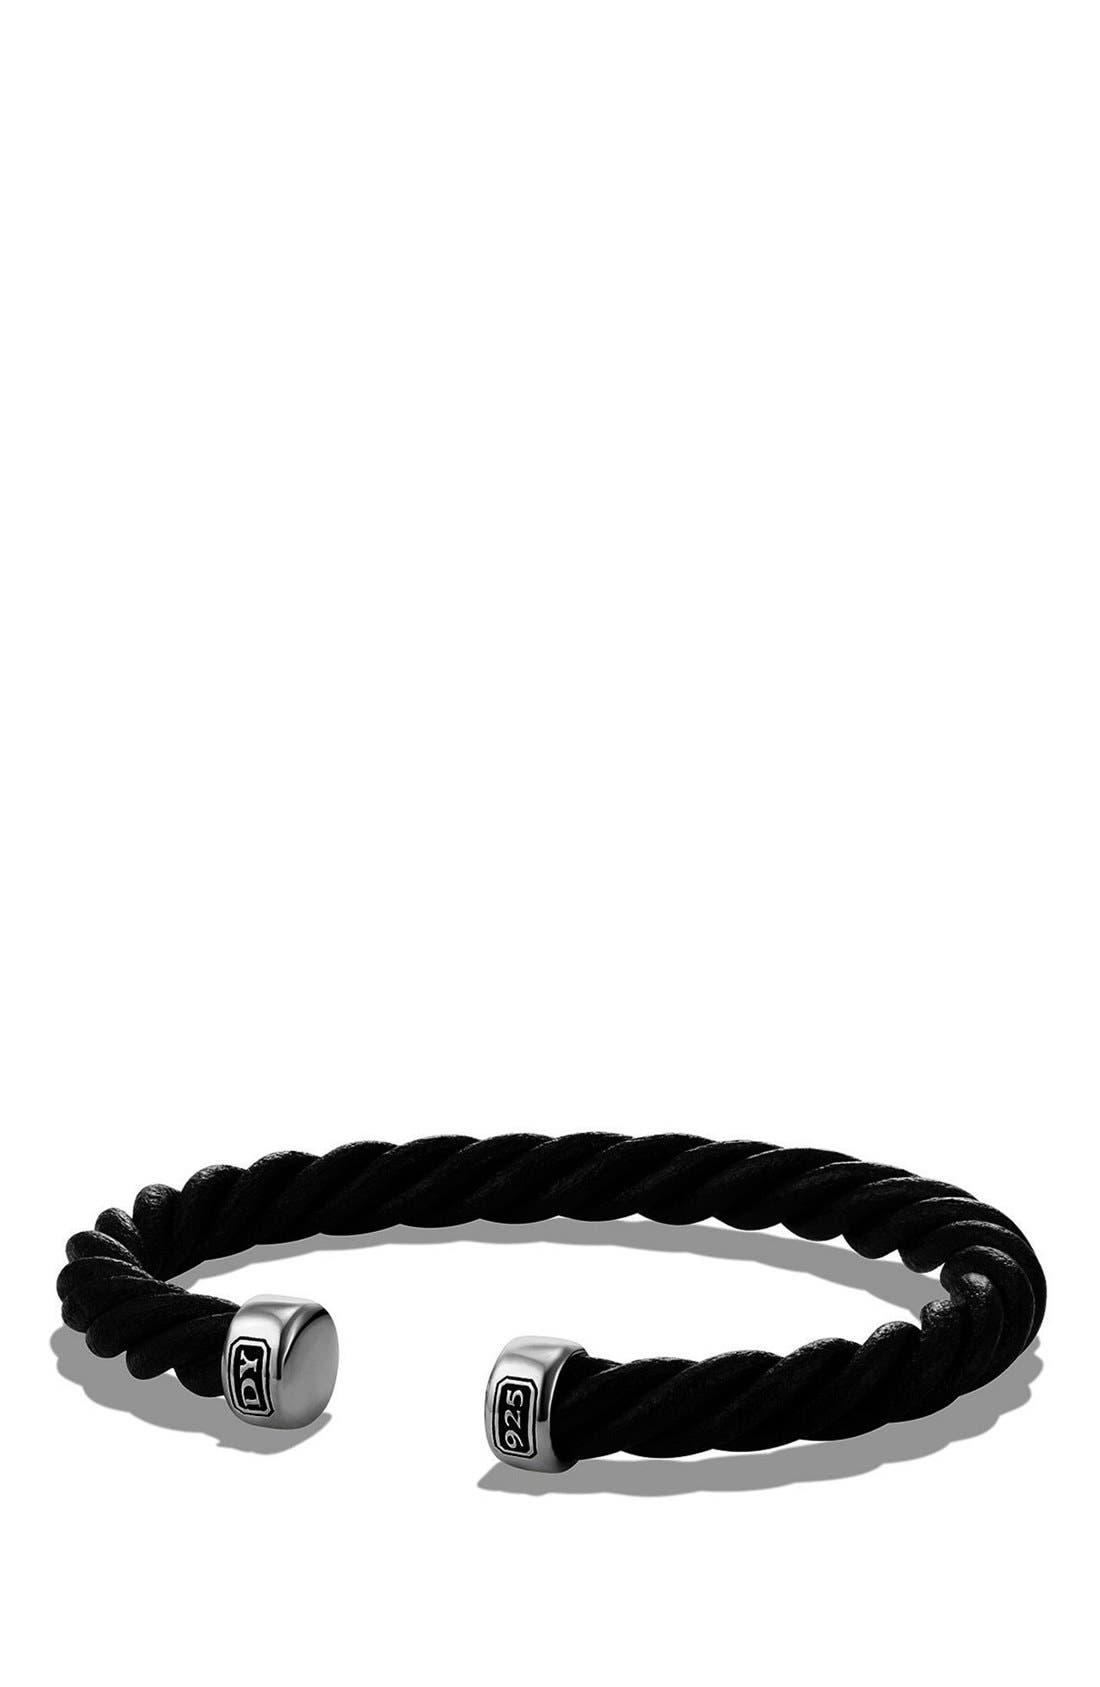 Leather Cuff Bracelet,                         Main,                         color, SILVER/ BLACK LEATHER